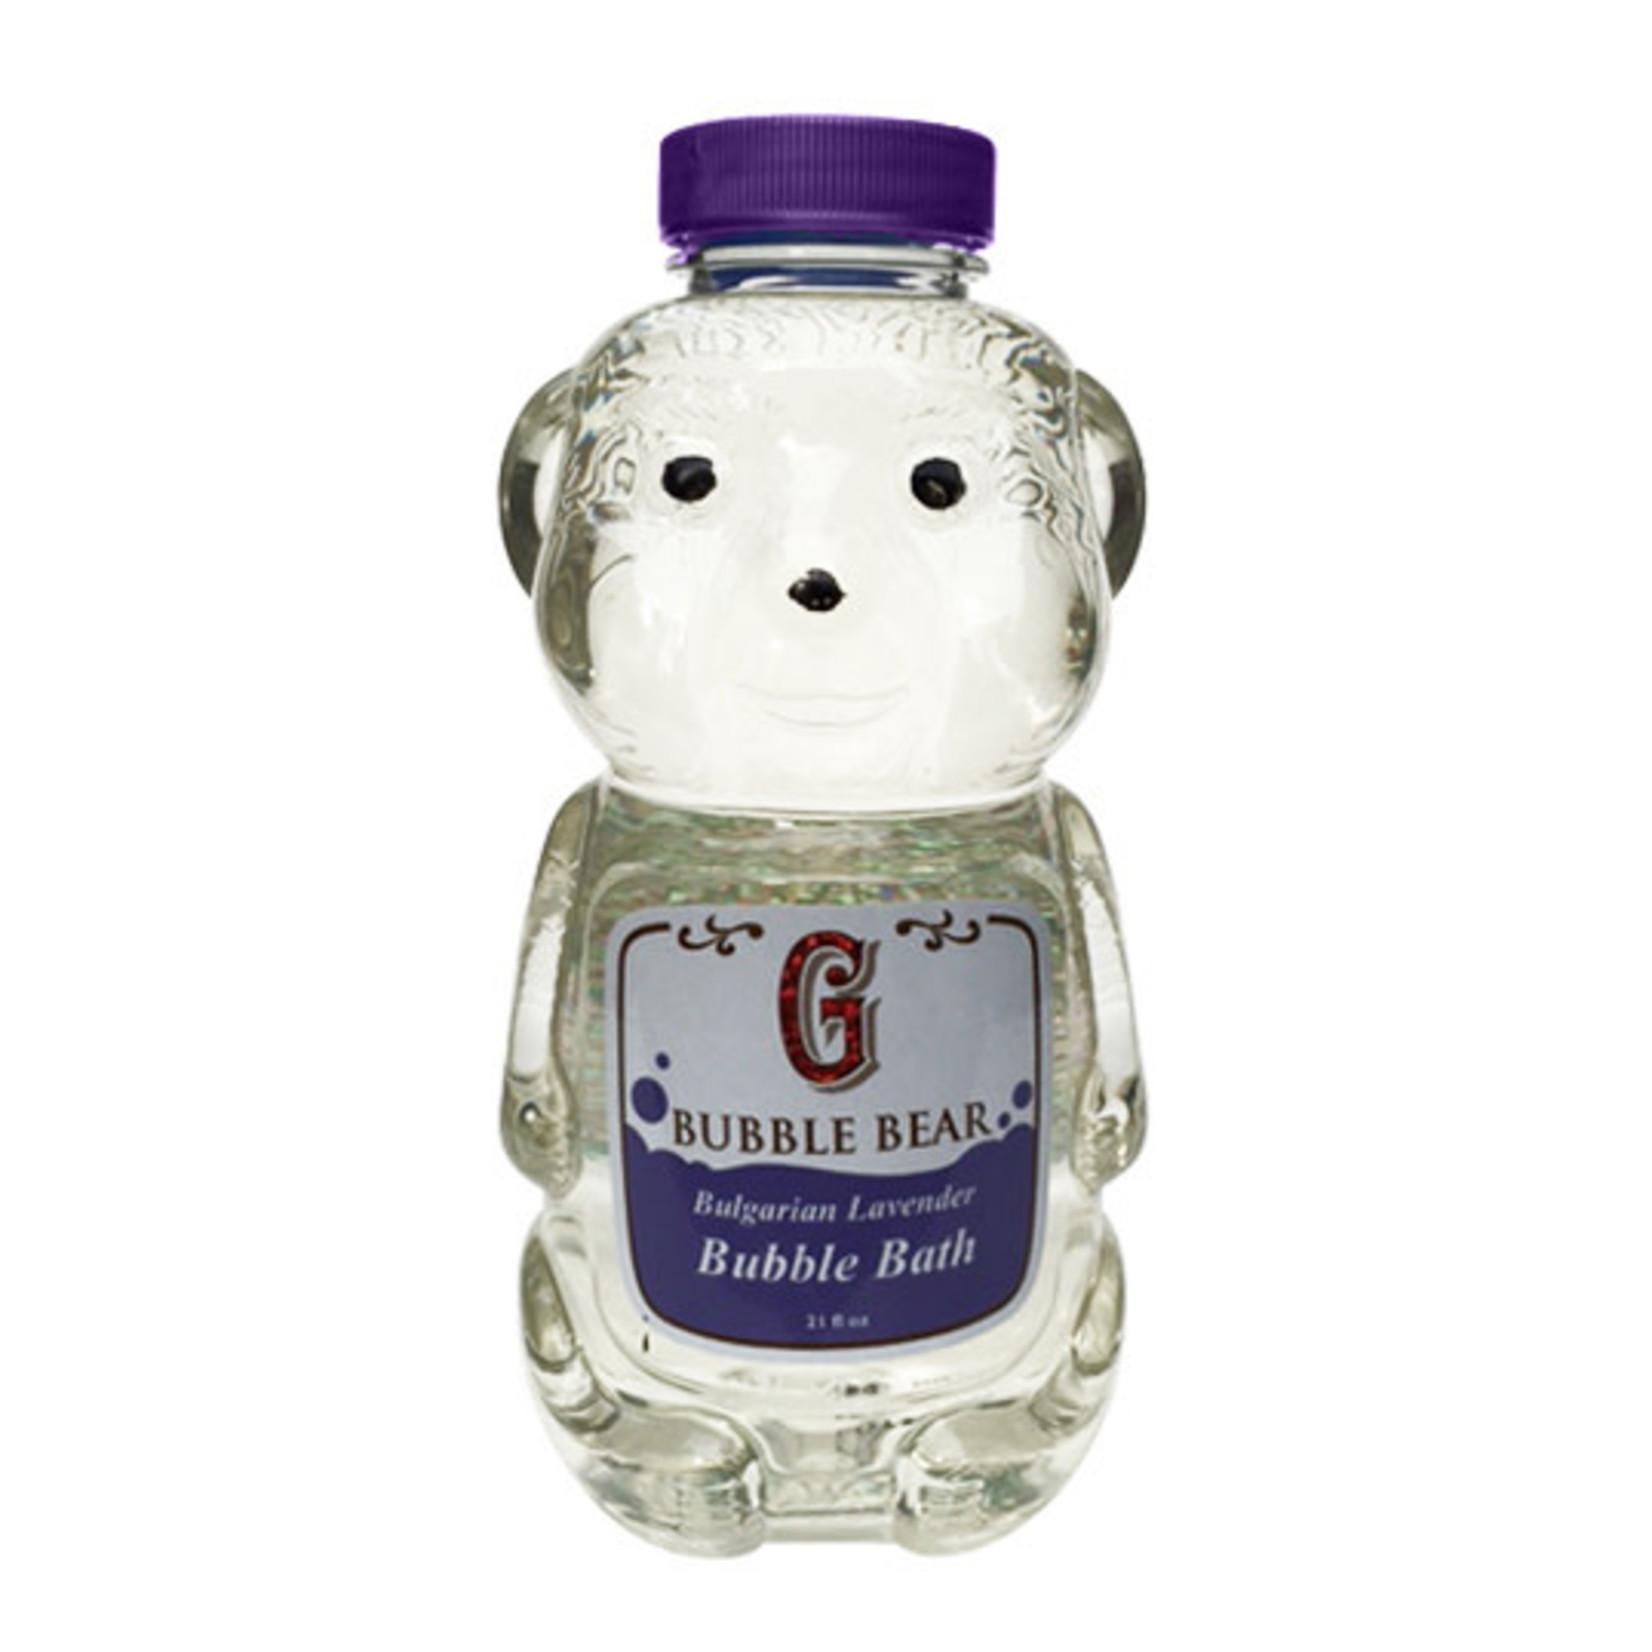 GRIFFIN REMEDY Griffin Remedy Bubble Bear Bubble Bath Bulgarian Lavender